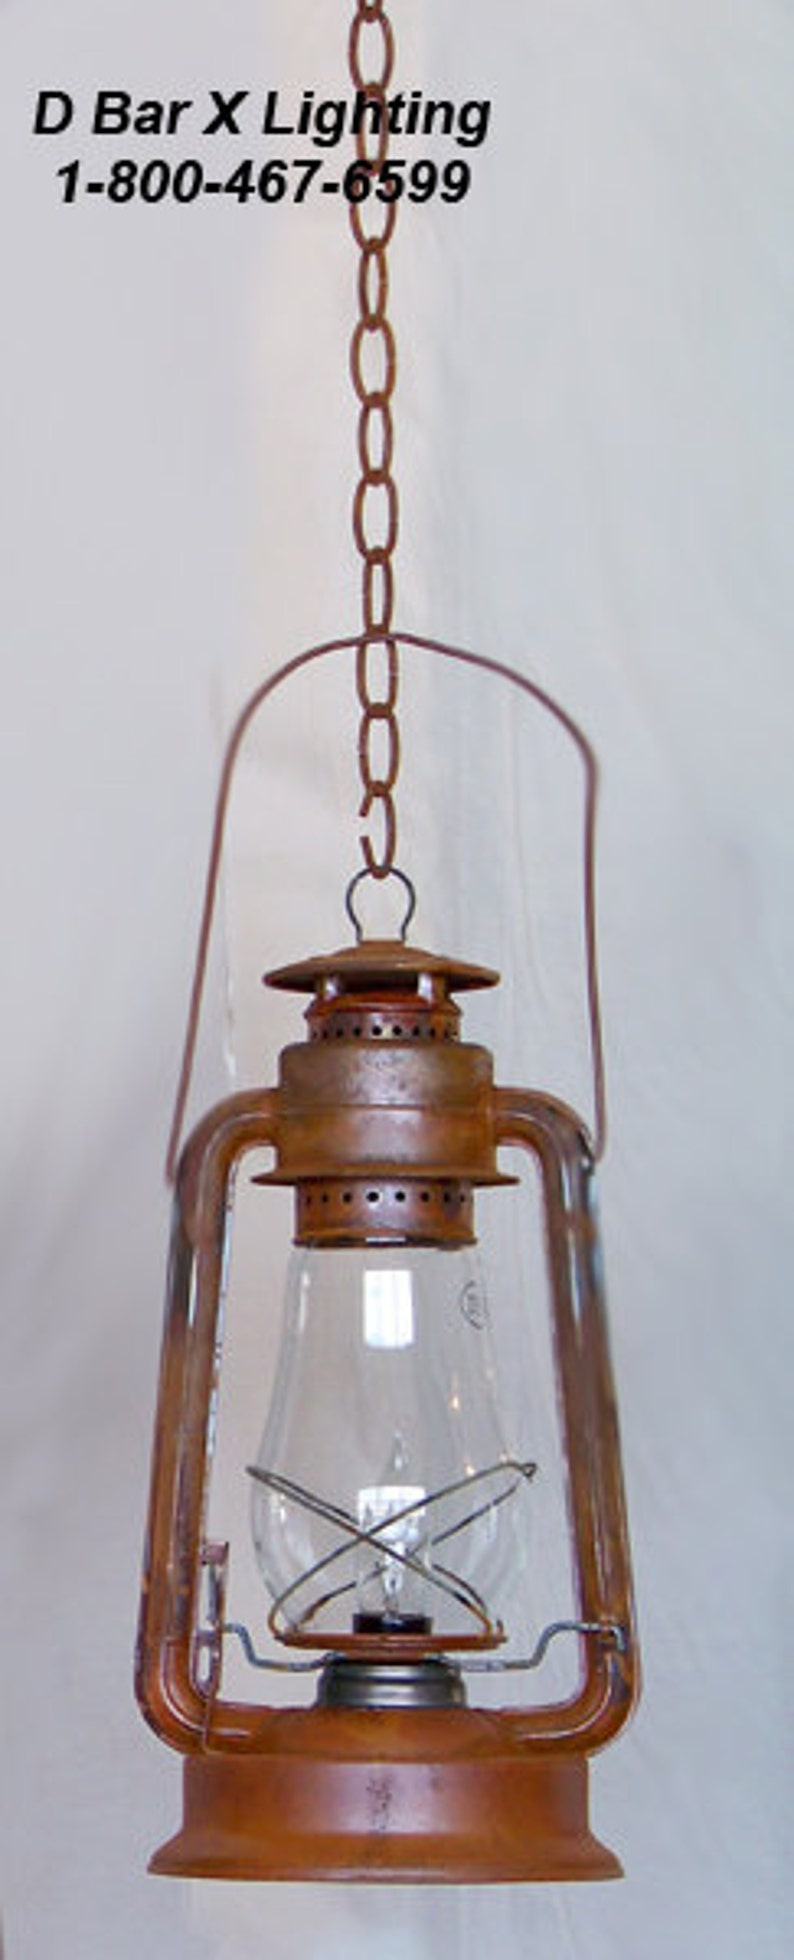 Dx735 15 rustic lantern pendant light fixture